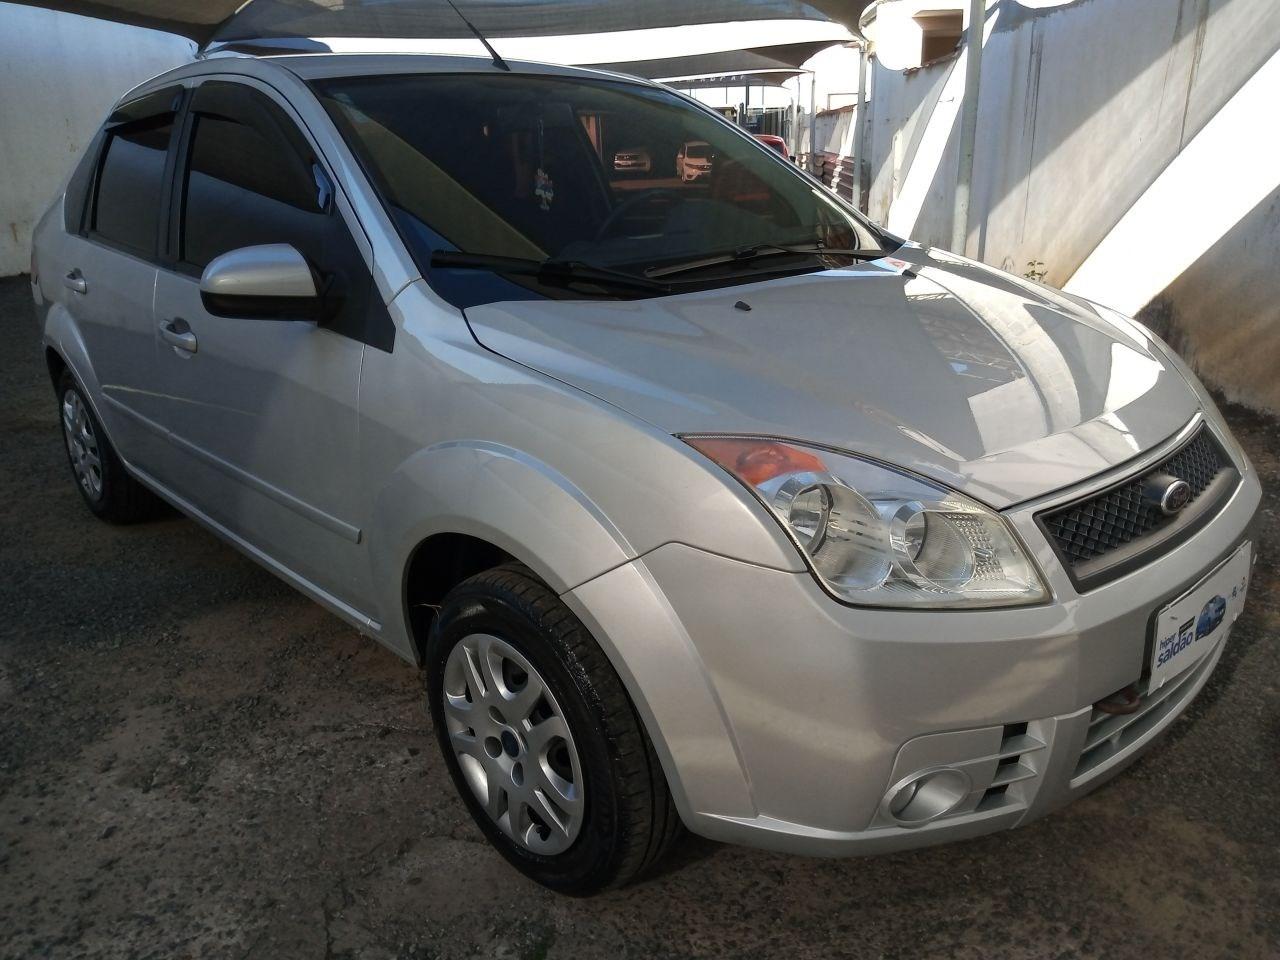 //www.autoline.com.br/carro/ford/fiesta-16-sedan-8v-flex-4p-manual/2008/salto-sp/15530907